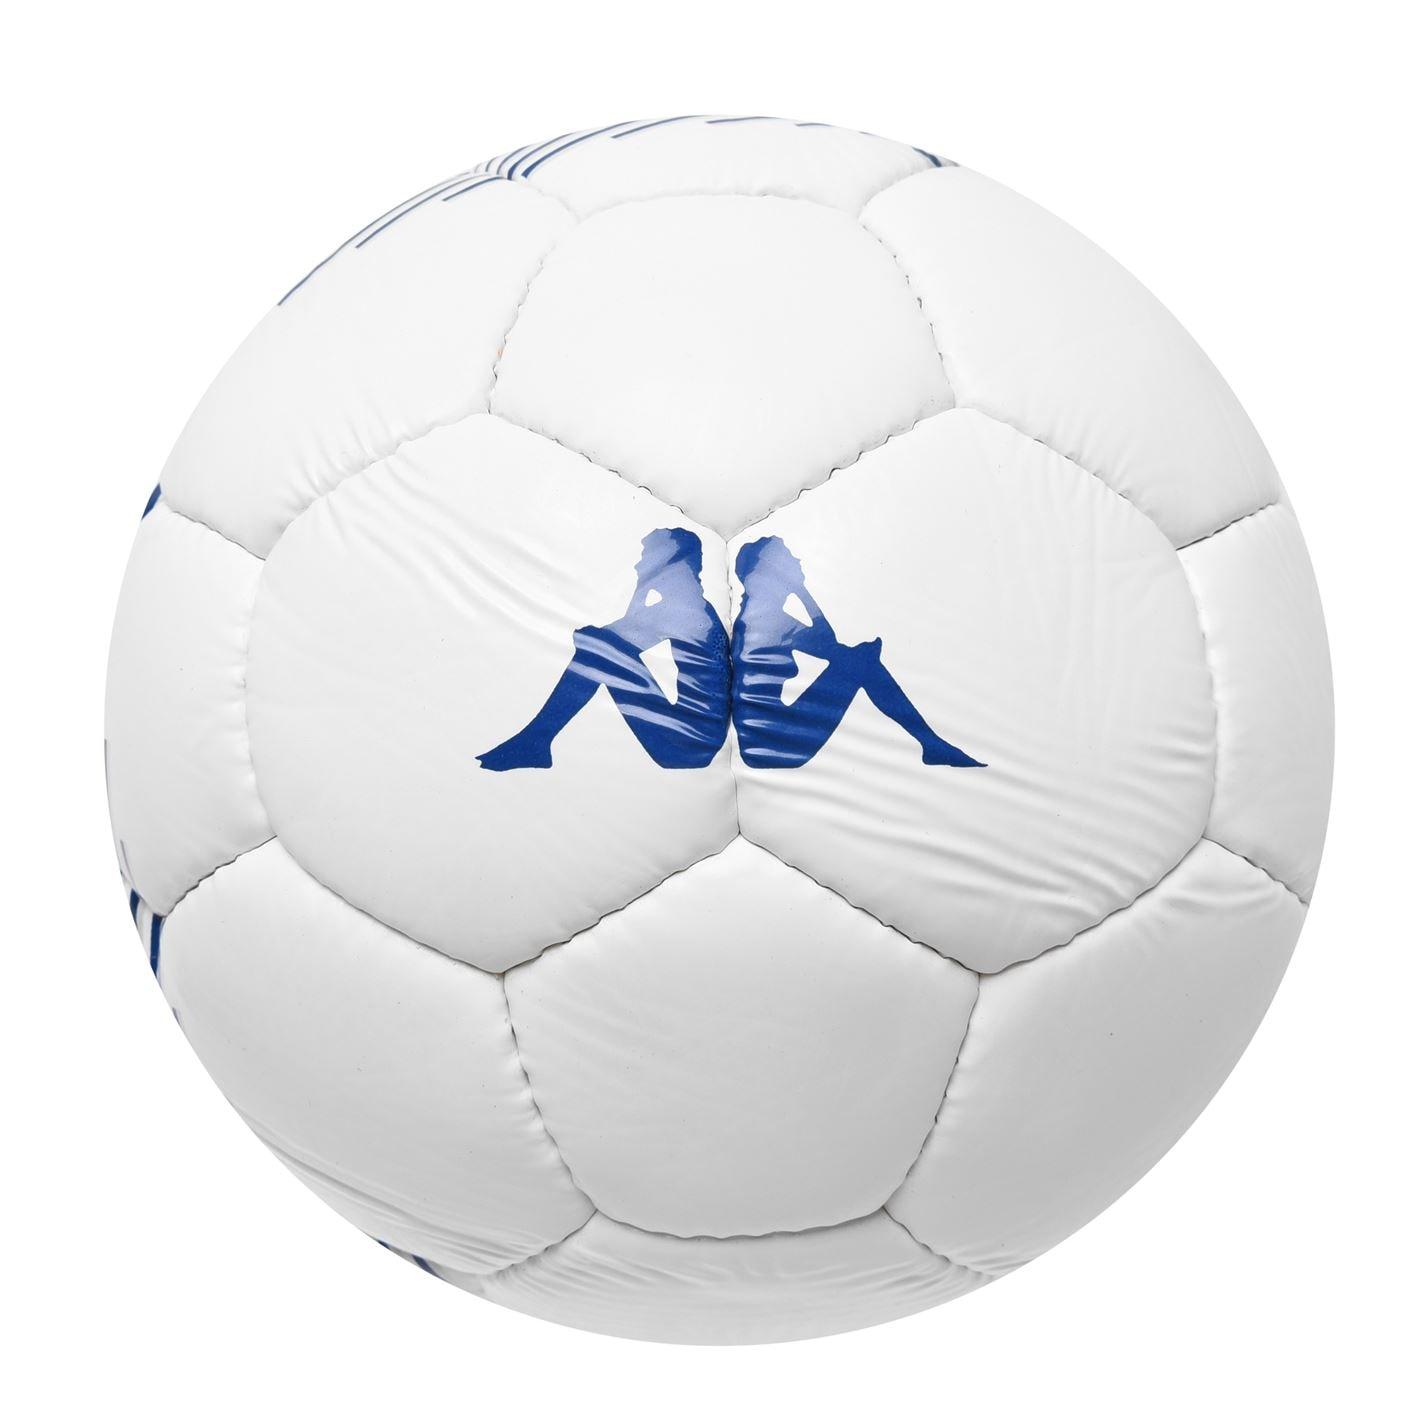 Mergi la Kappa fotbal alb albastru roial